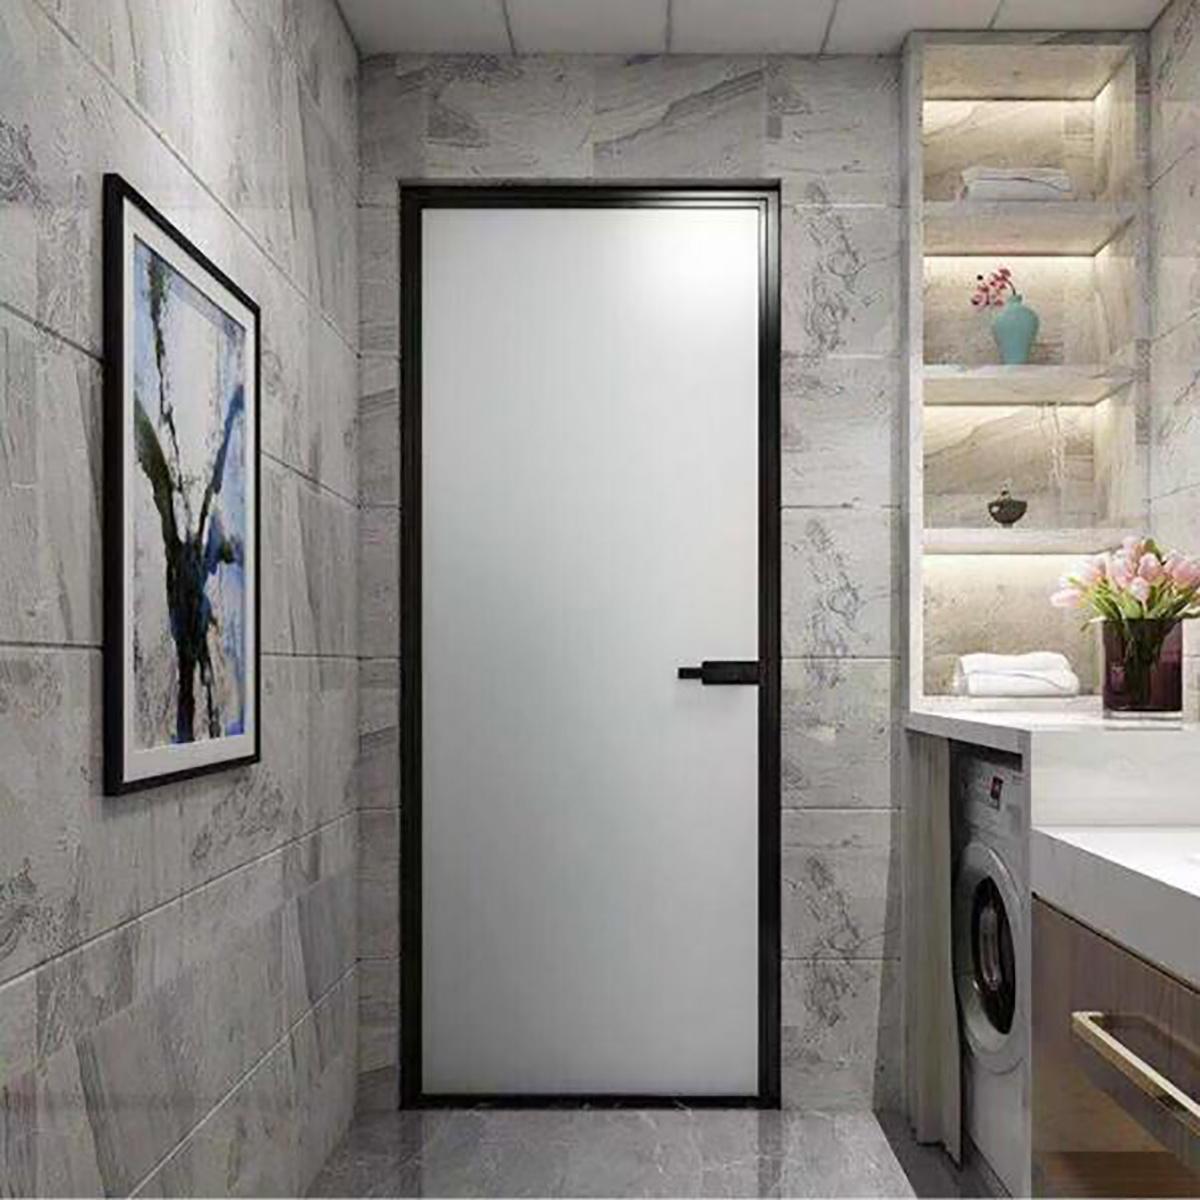 China Foshan Product Modern House Interior Aluminum Bathroom Doors Rest Room China House Product Aluminum Doors Rest Room